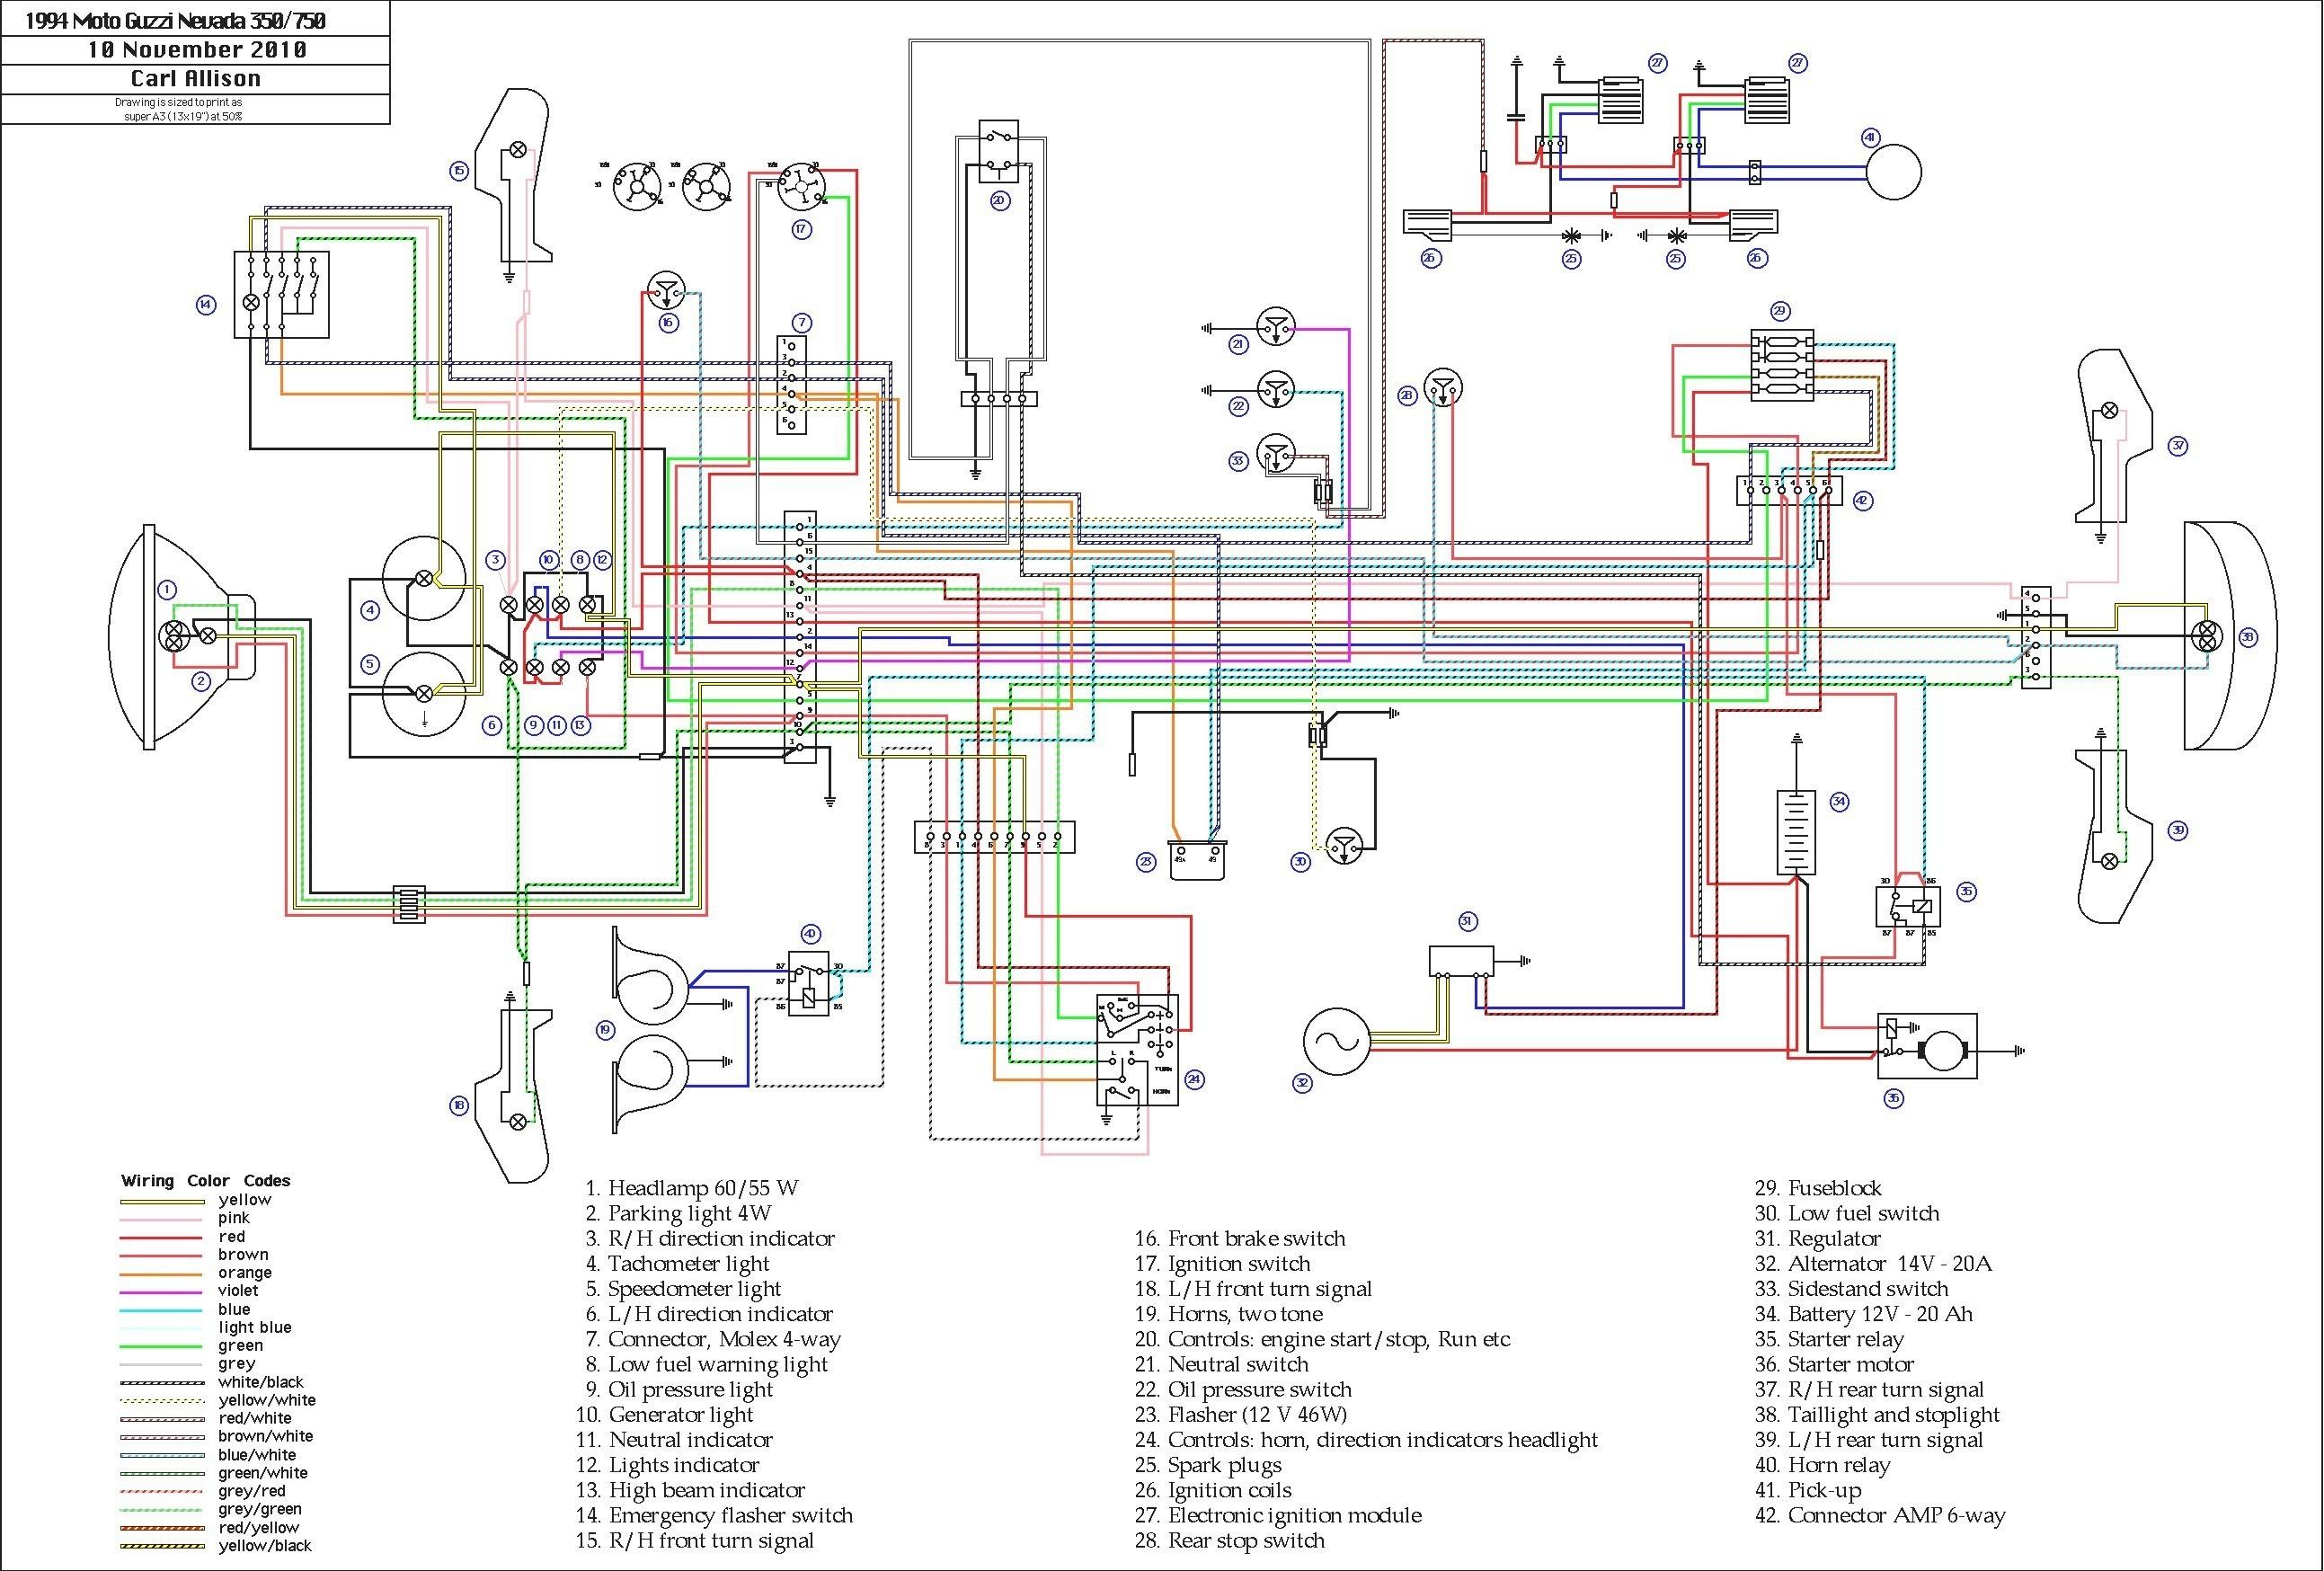 Nsh 55rh Wiring Diagram Dc Wiring Diagram Repair Guides Nsh 55rh Wiring Diagram Dc